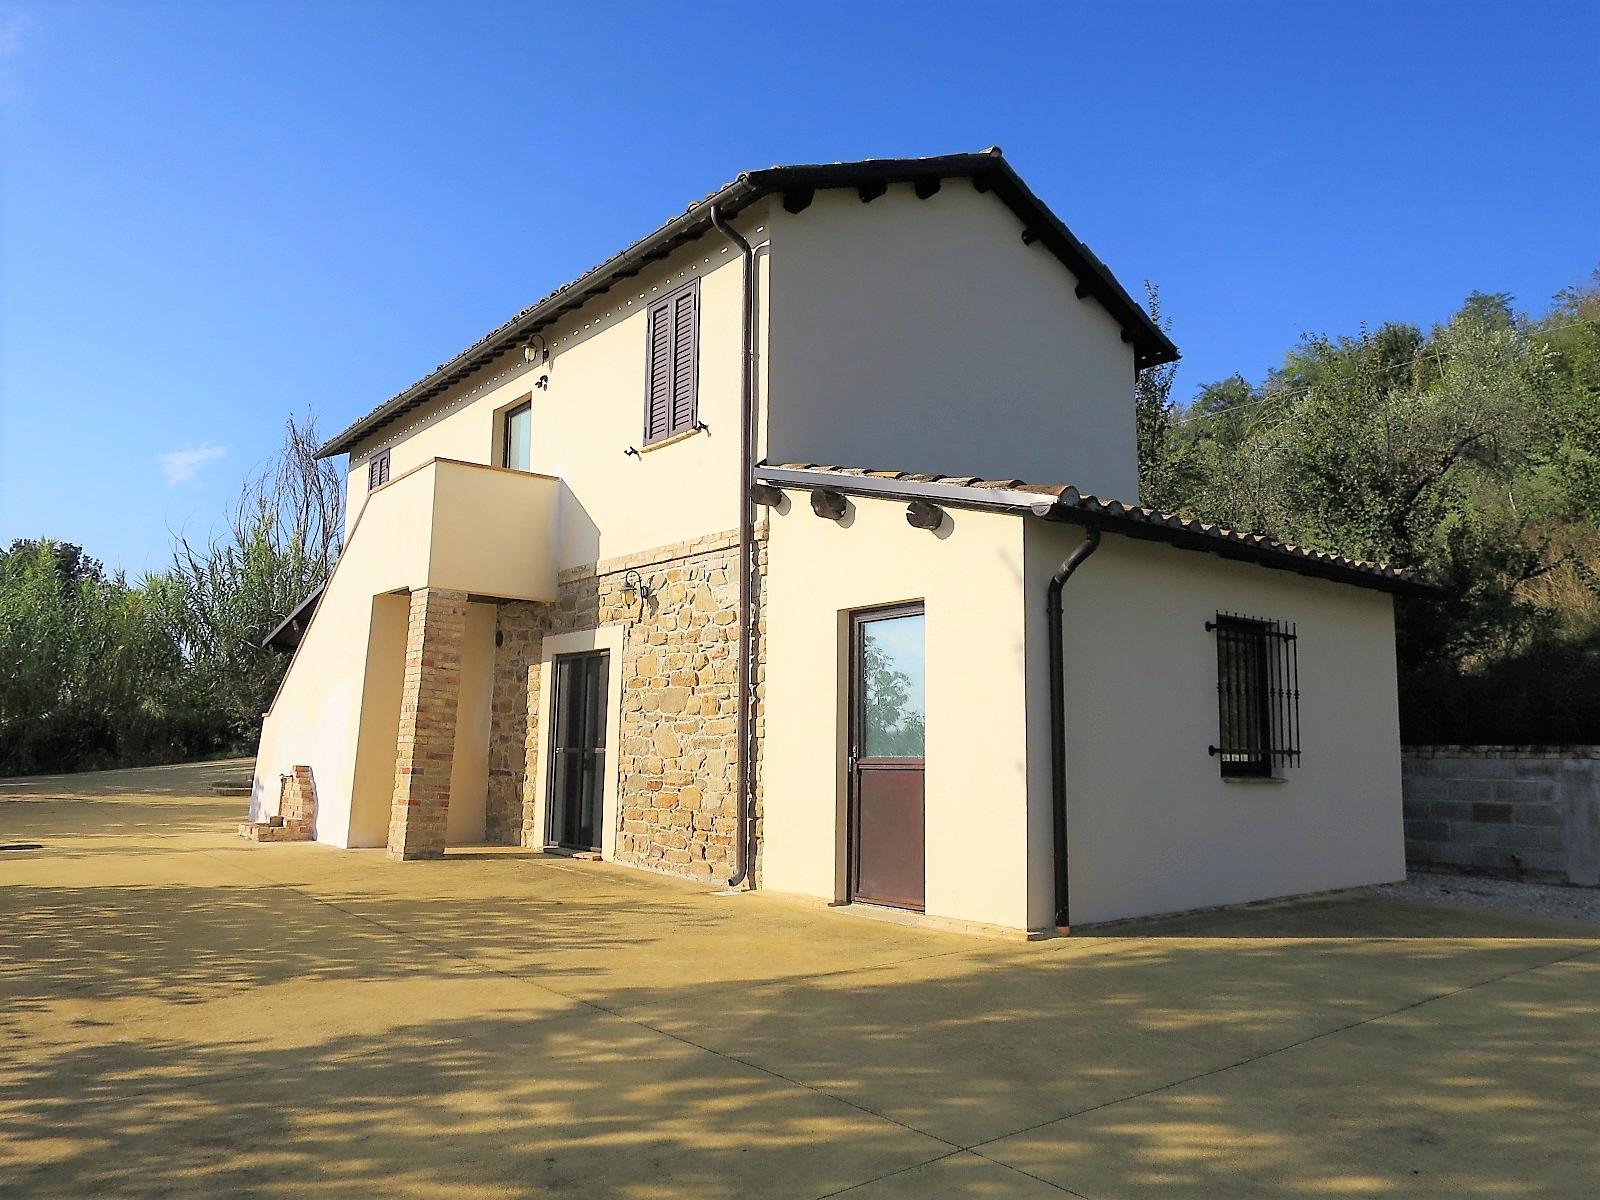 Country Houses Country Houses for sale Montefino (TE), Casa Collina - Montefino - EUR 151.447 260